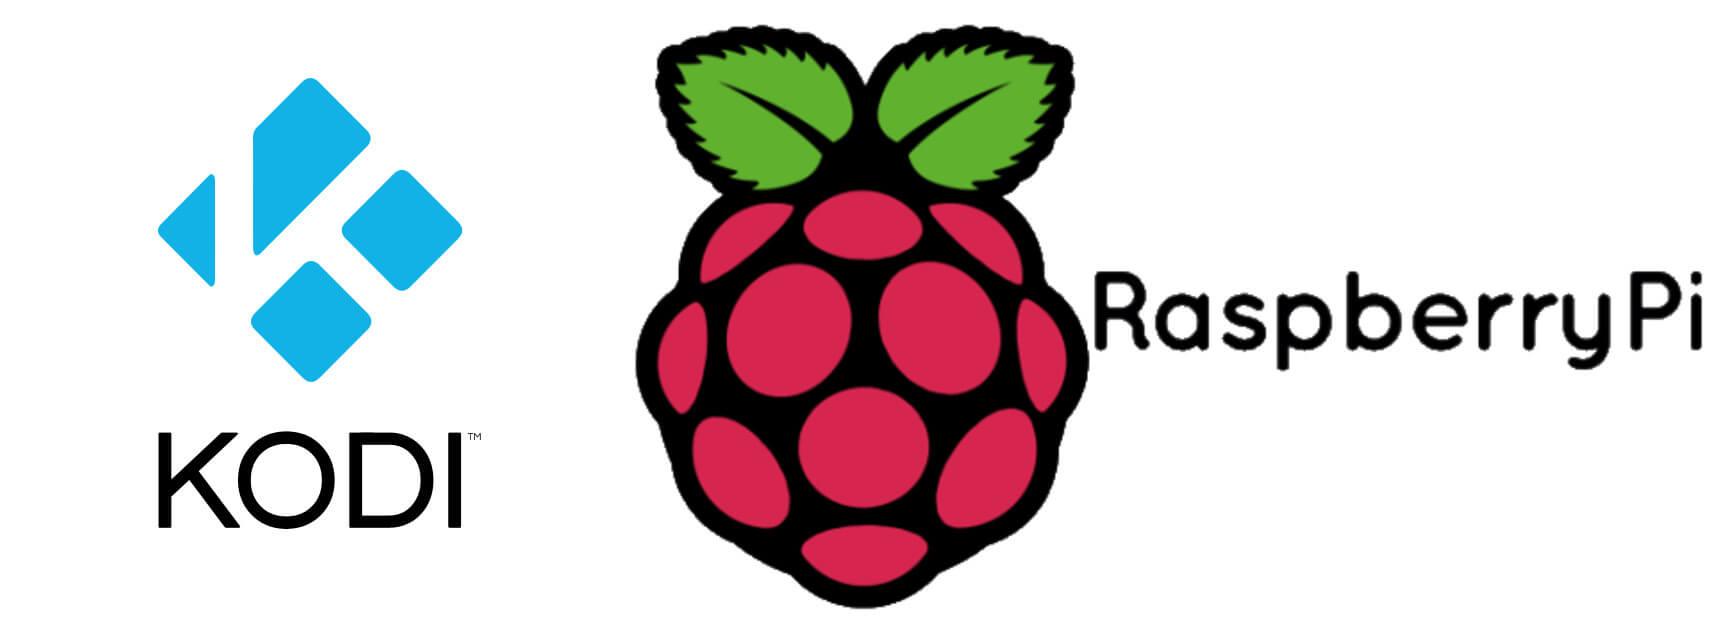 How to Install Kodi on Raspberry Pi, Pi 2, Pi 3 And Raspbian